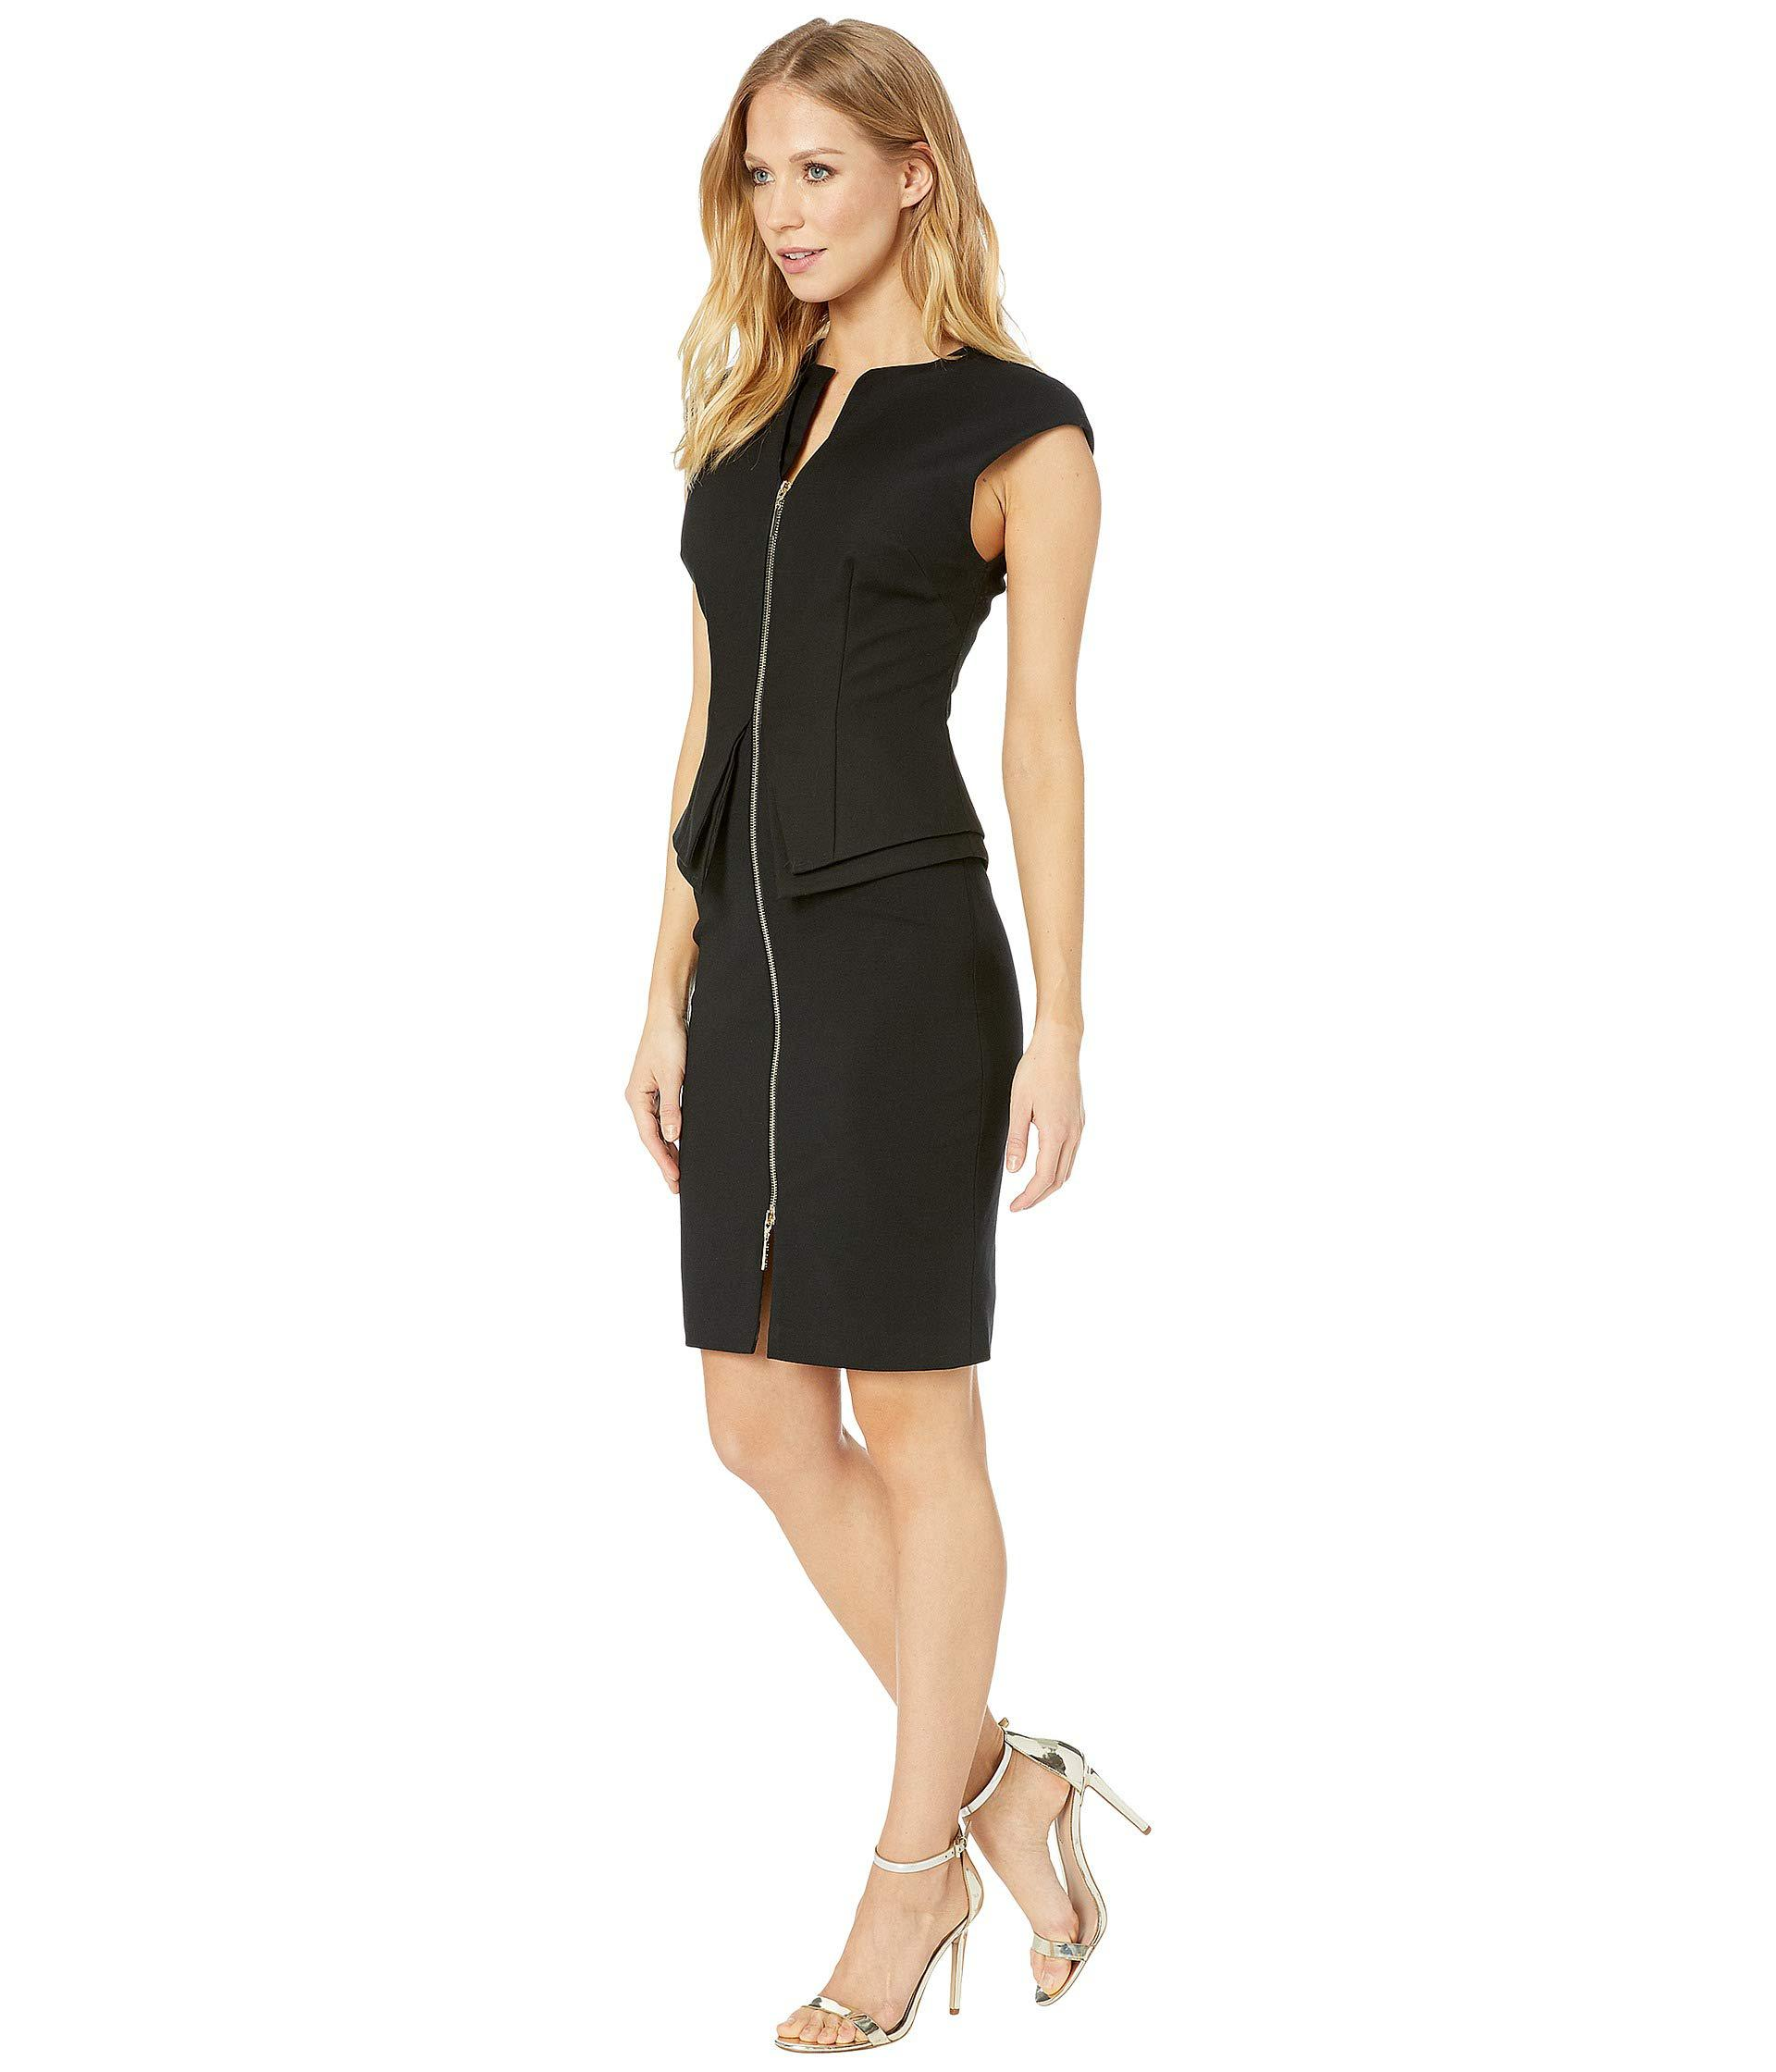 7c9a0de8830590 Lyst - Ted Baker Structured Zip Peplum Dress (black) Women s Clothing in  Black